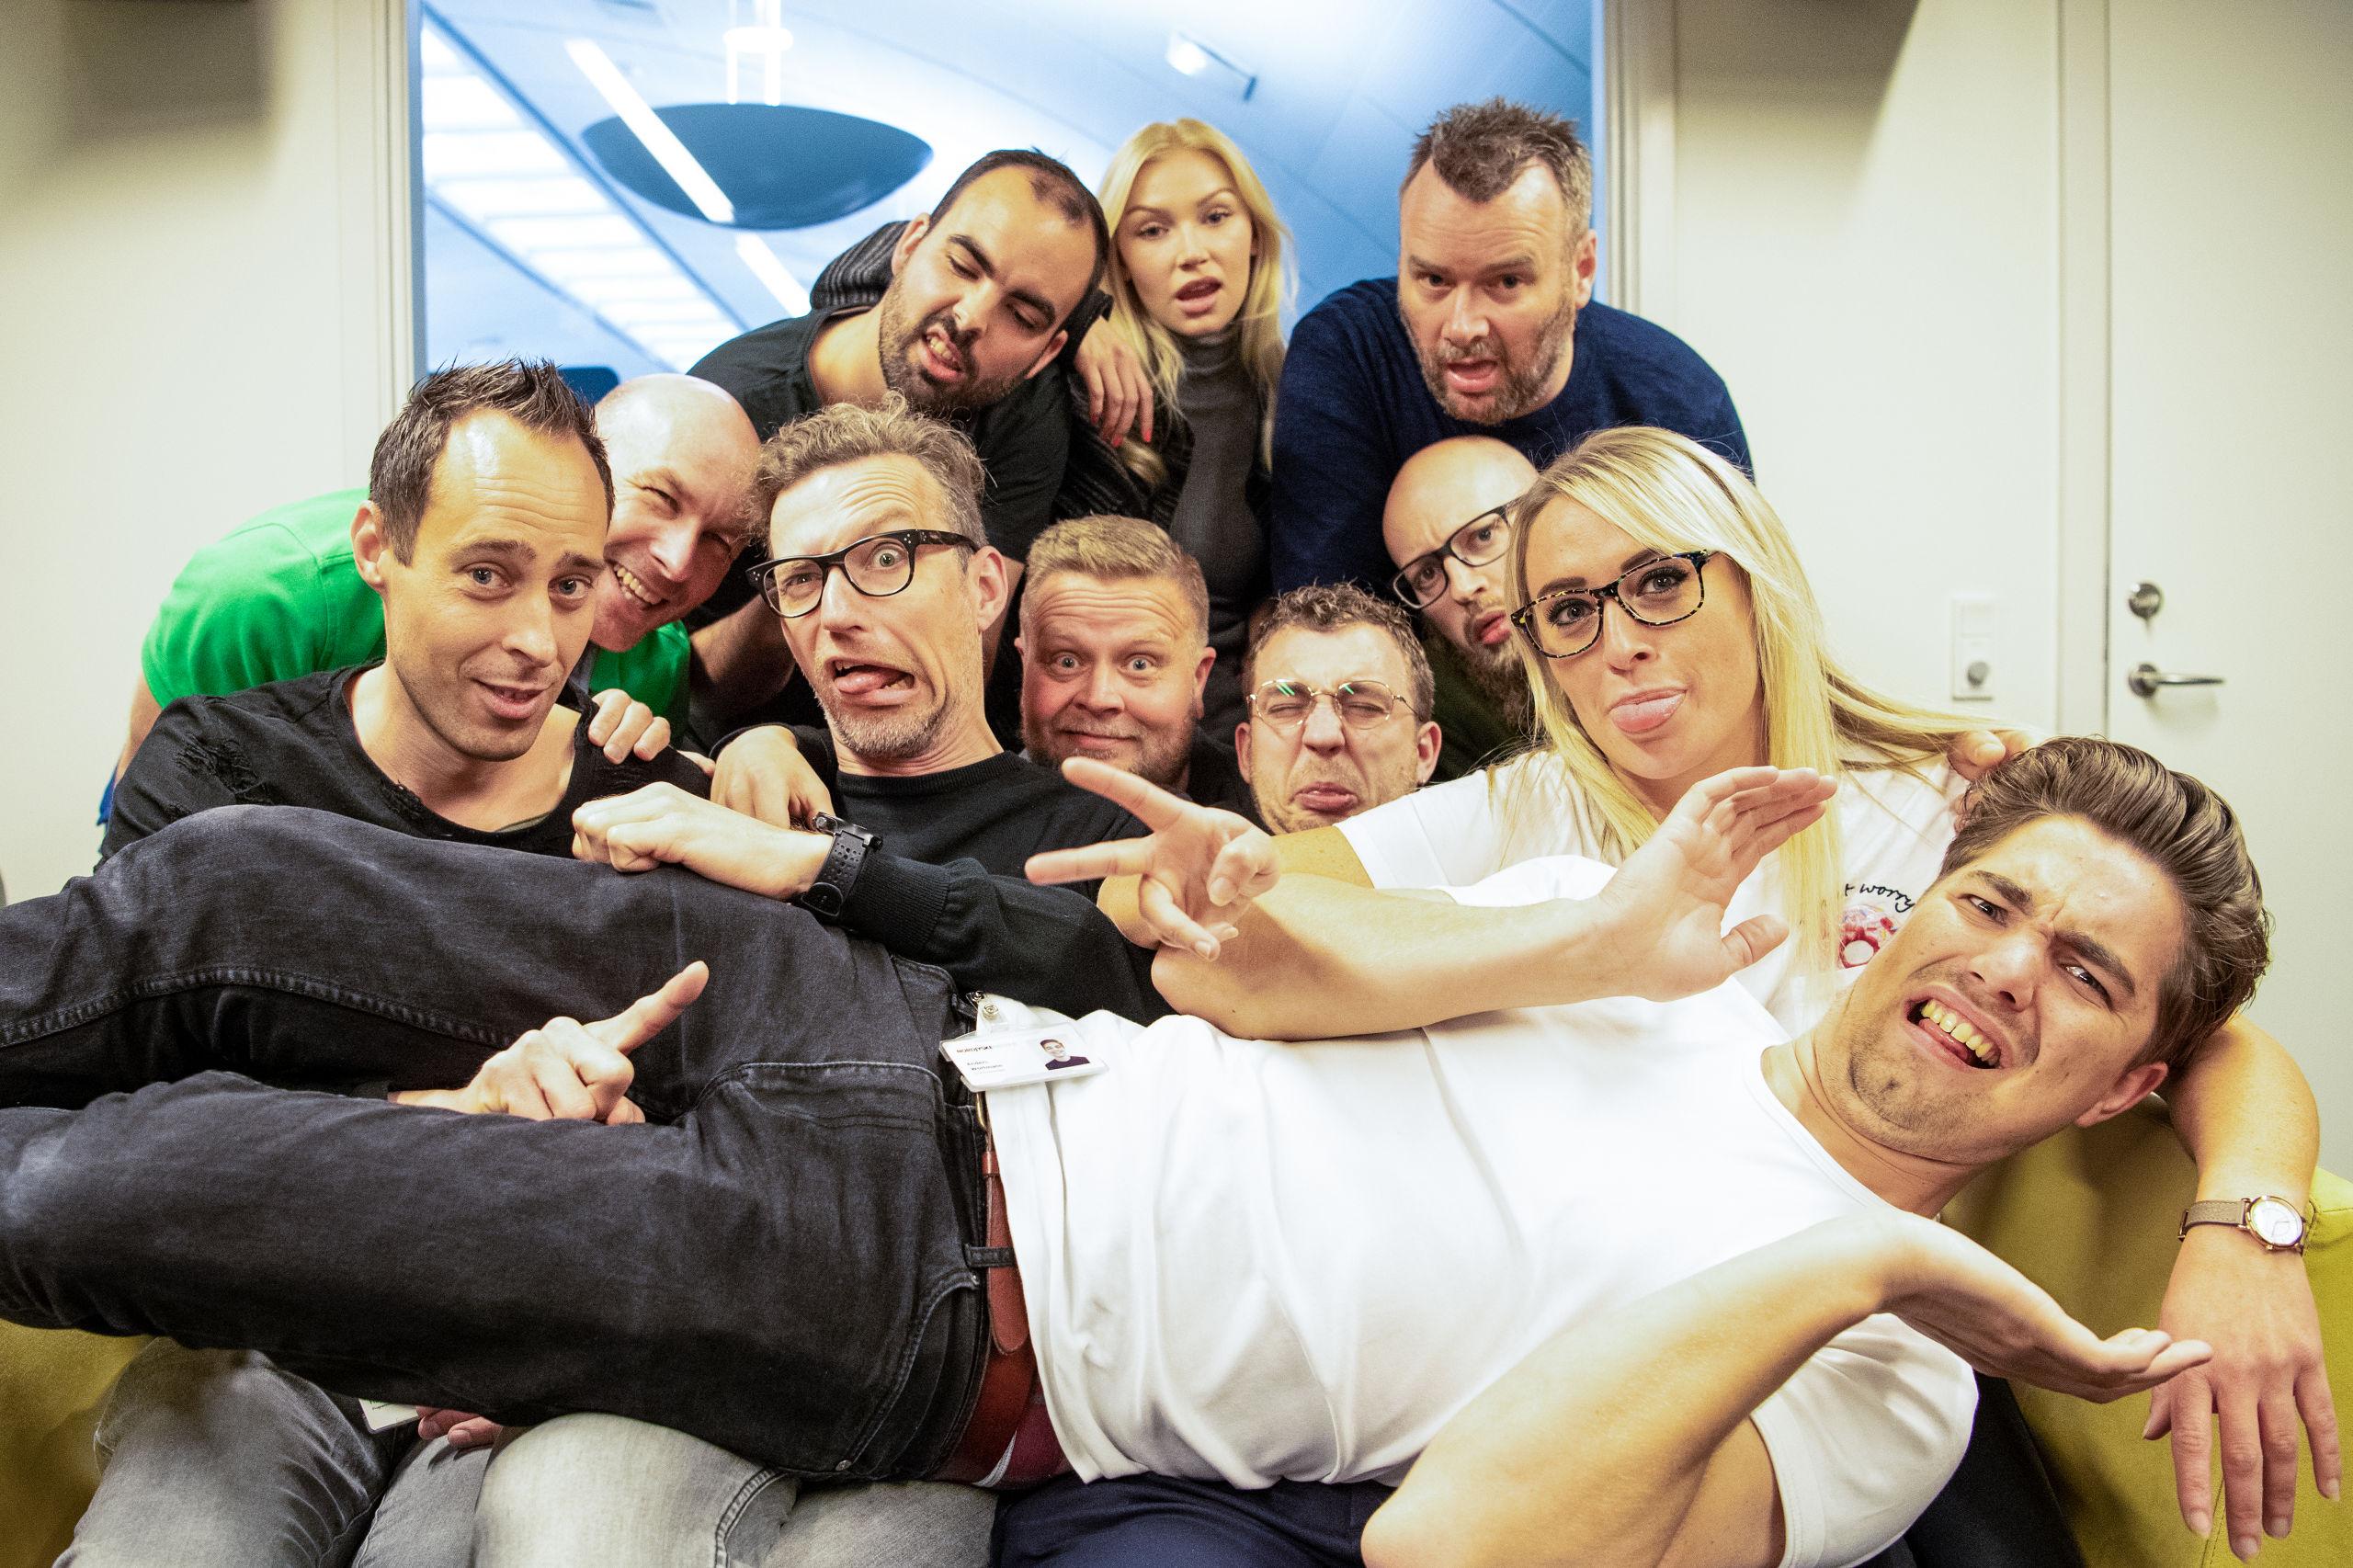 Legendarisk satire vender tilbage: Du får snart mere Farlig Fredag